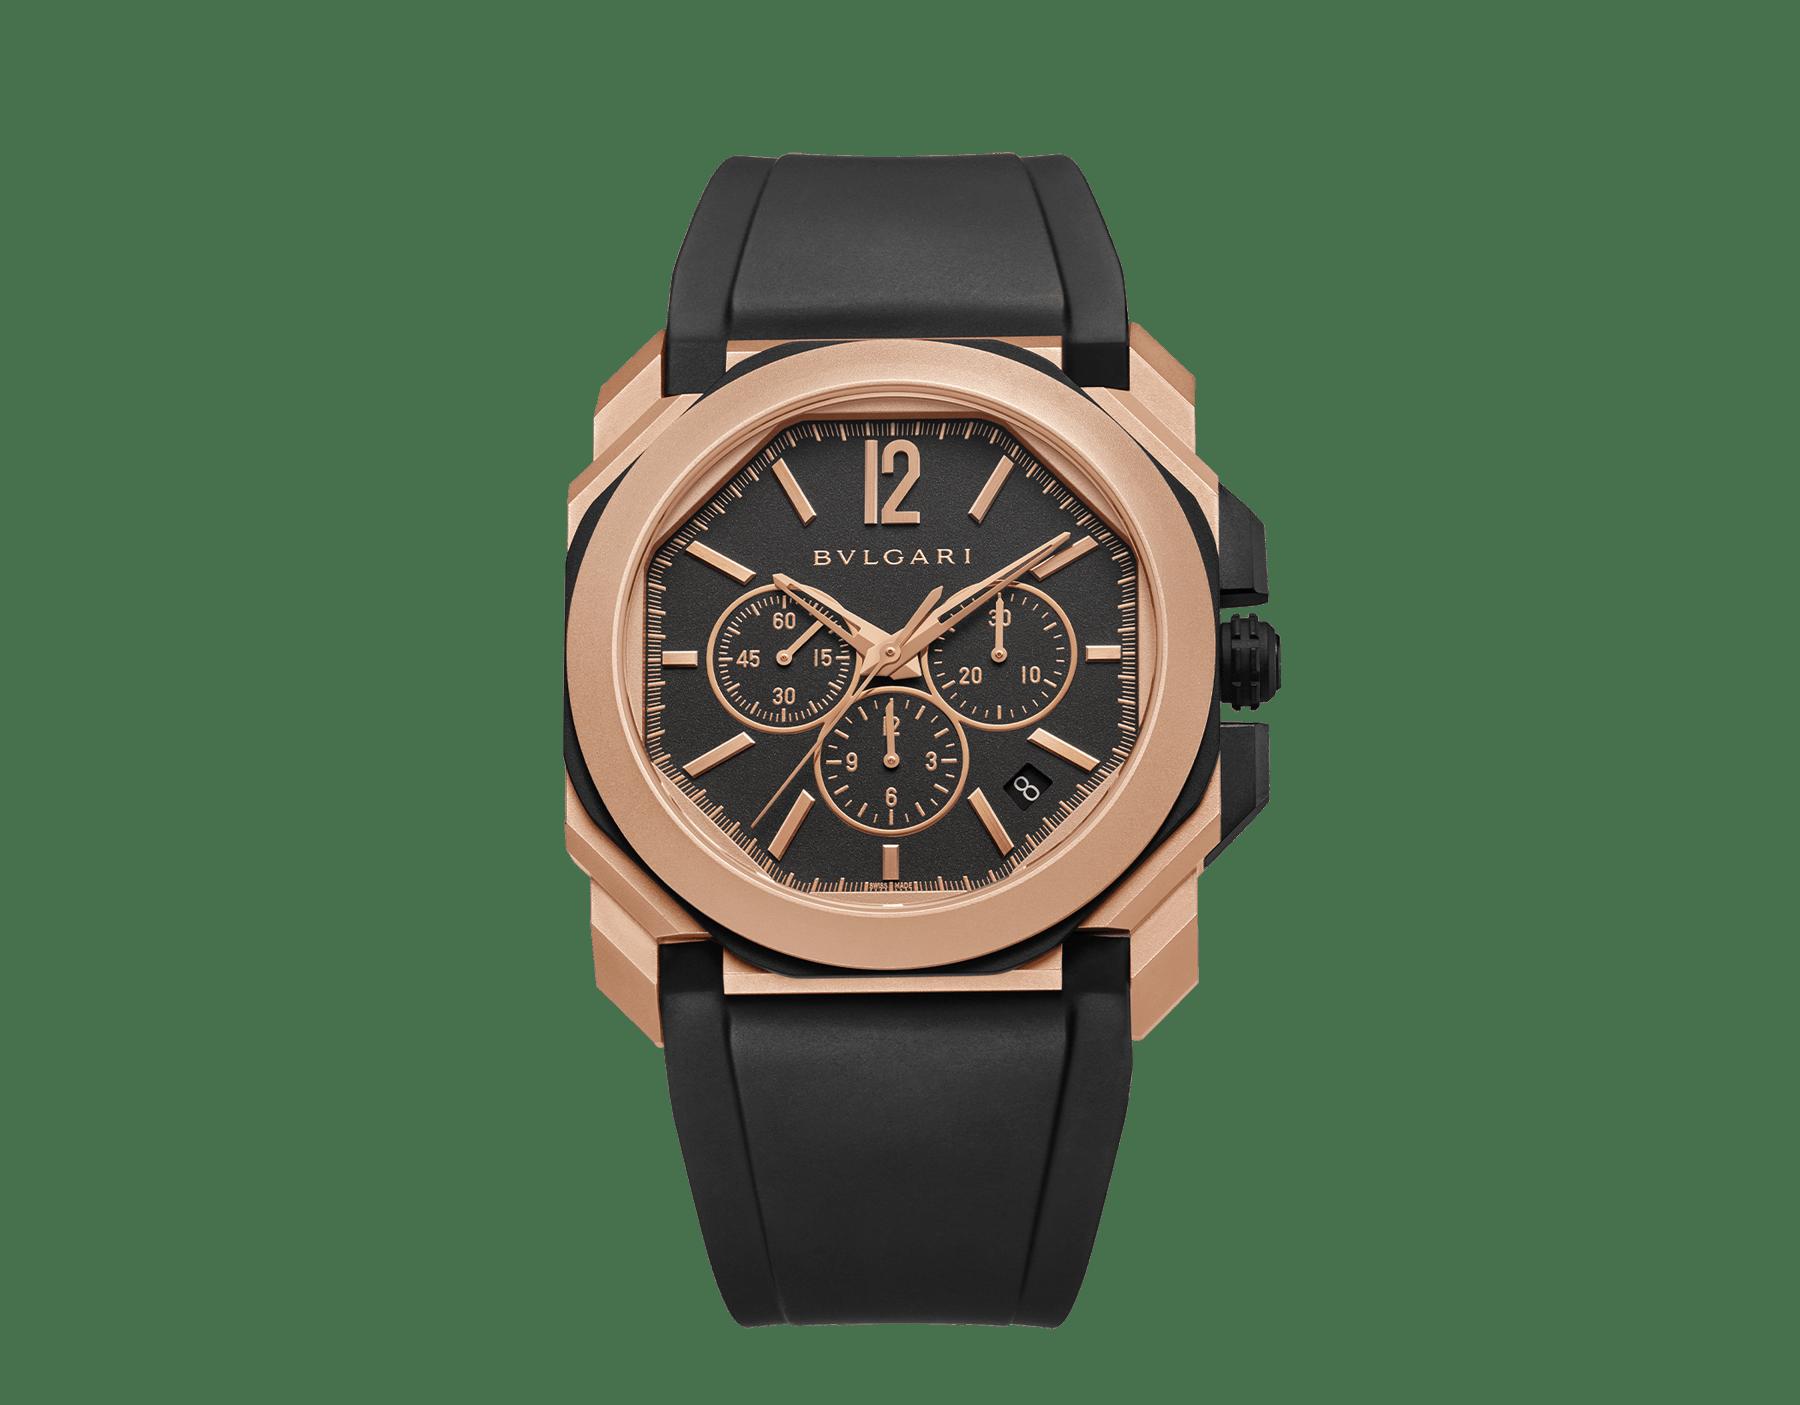 NEW OCTO L'ORIGINALE WATCH chrono 41mm